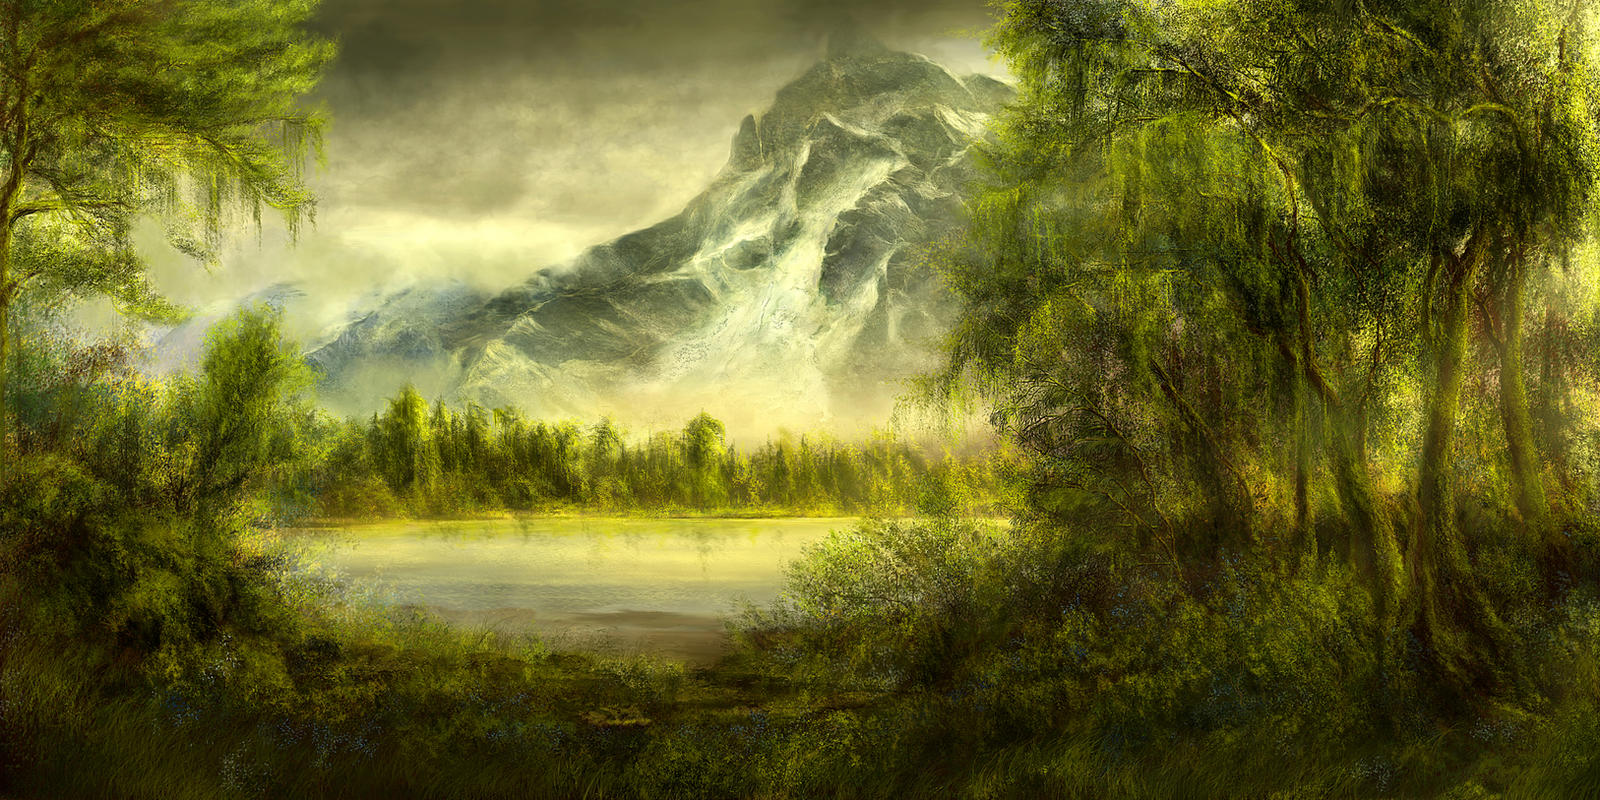 Tranquility by ValentiniaK